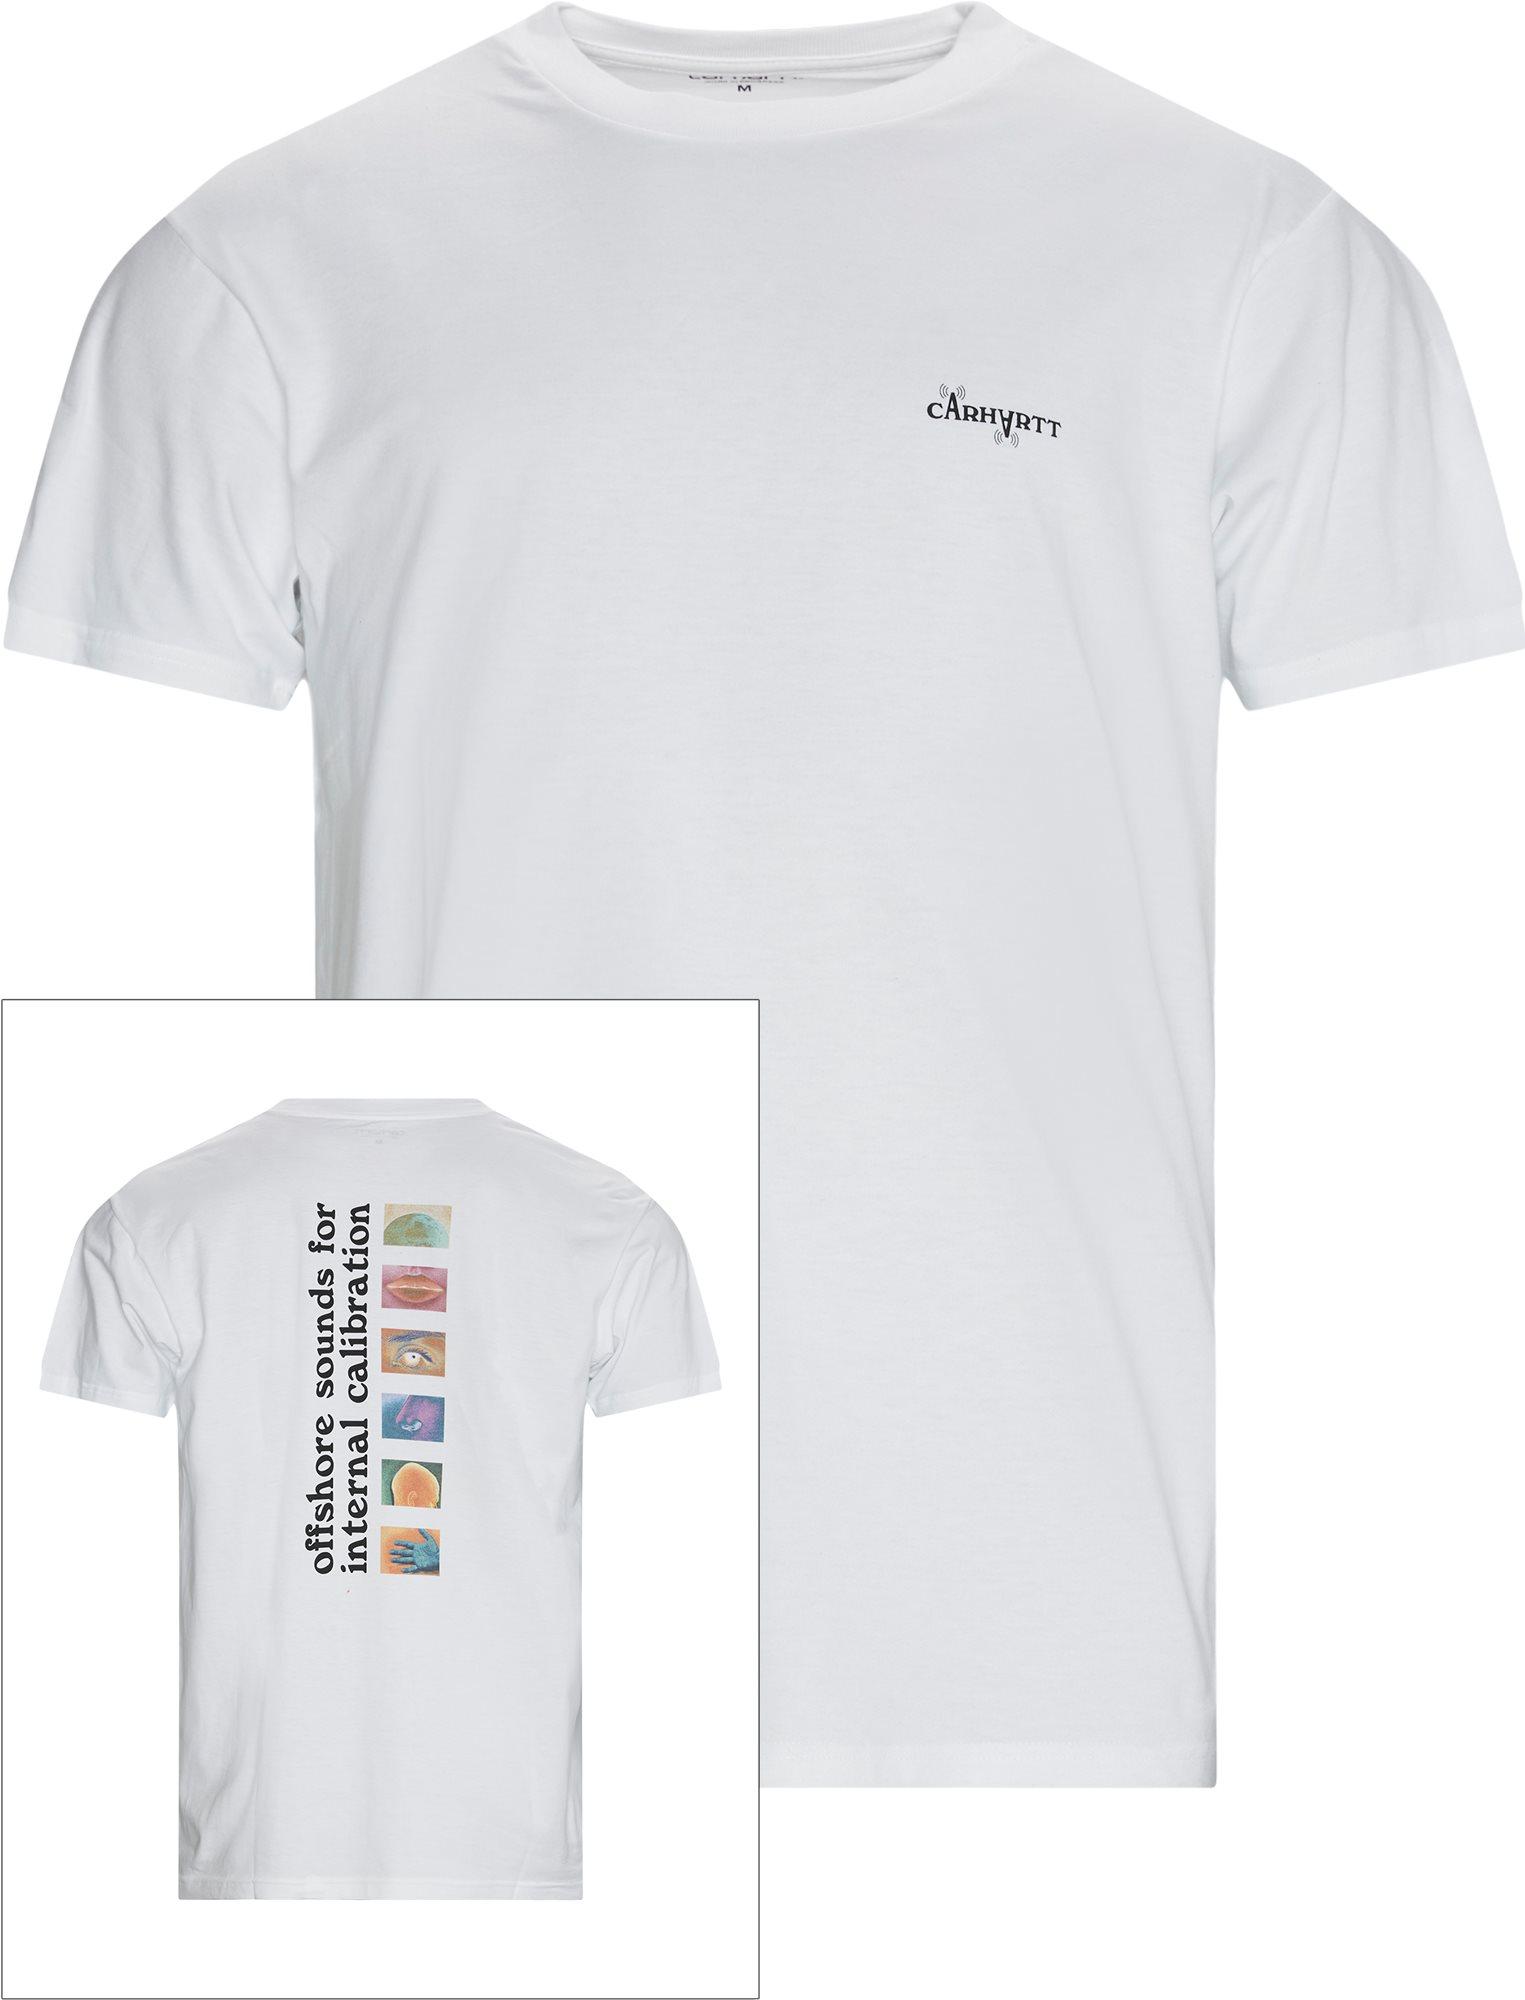 Calibrate Tee - T-shirts - Regular fit - White